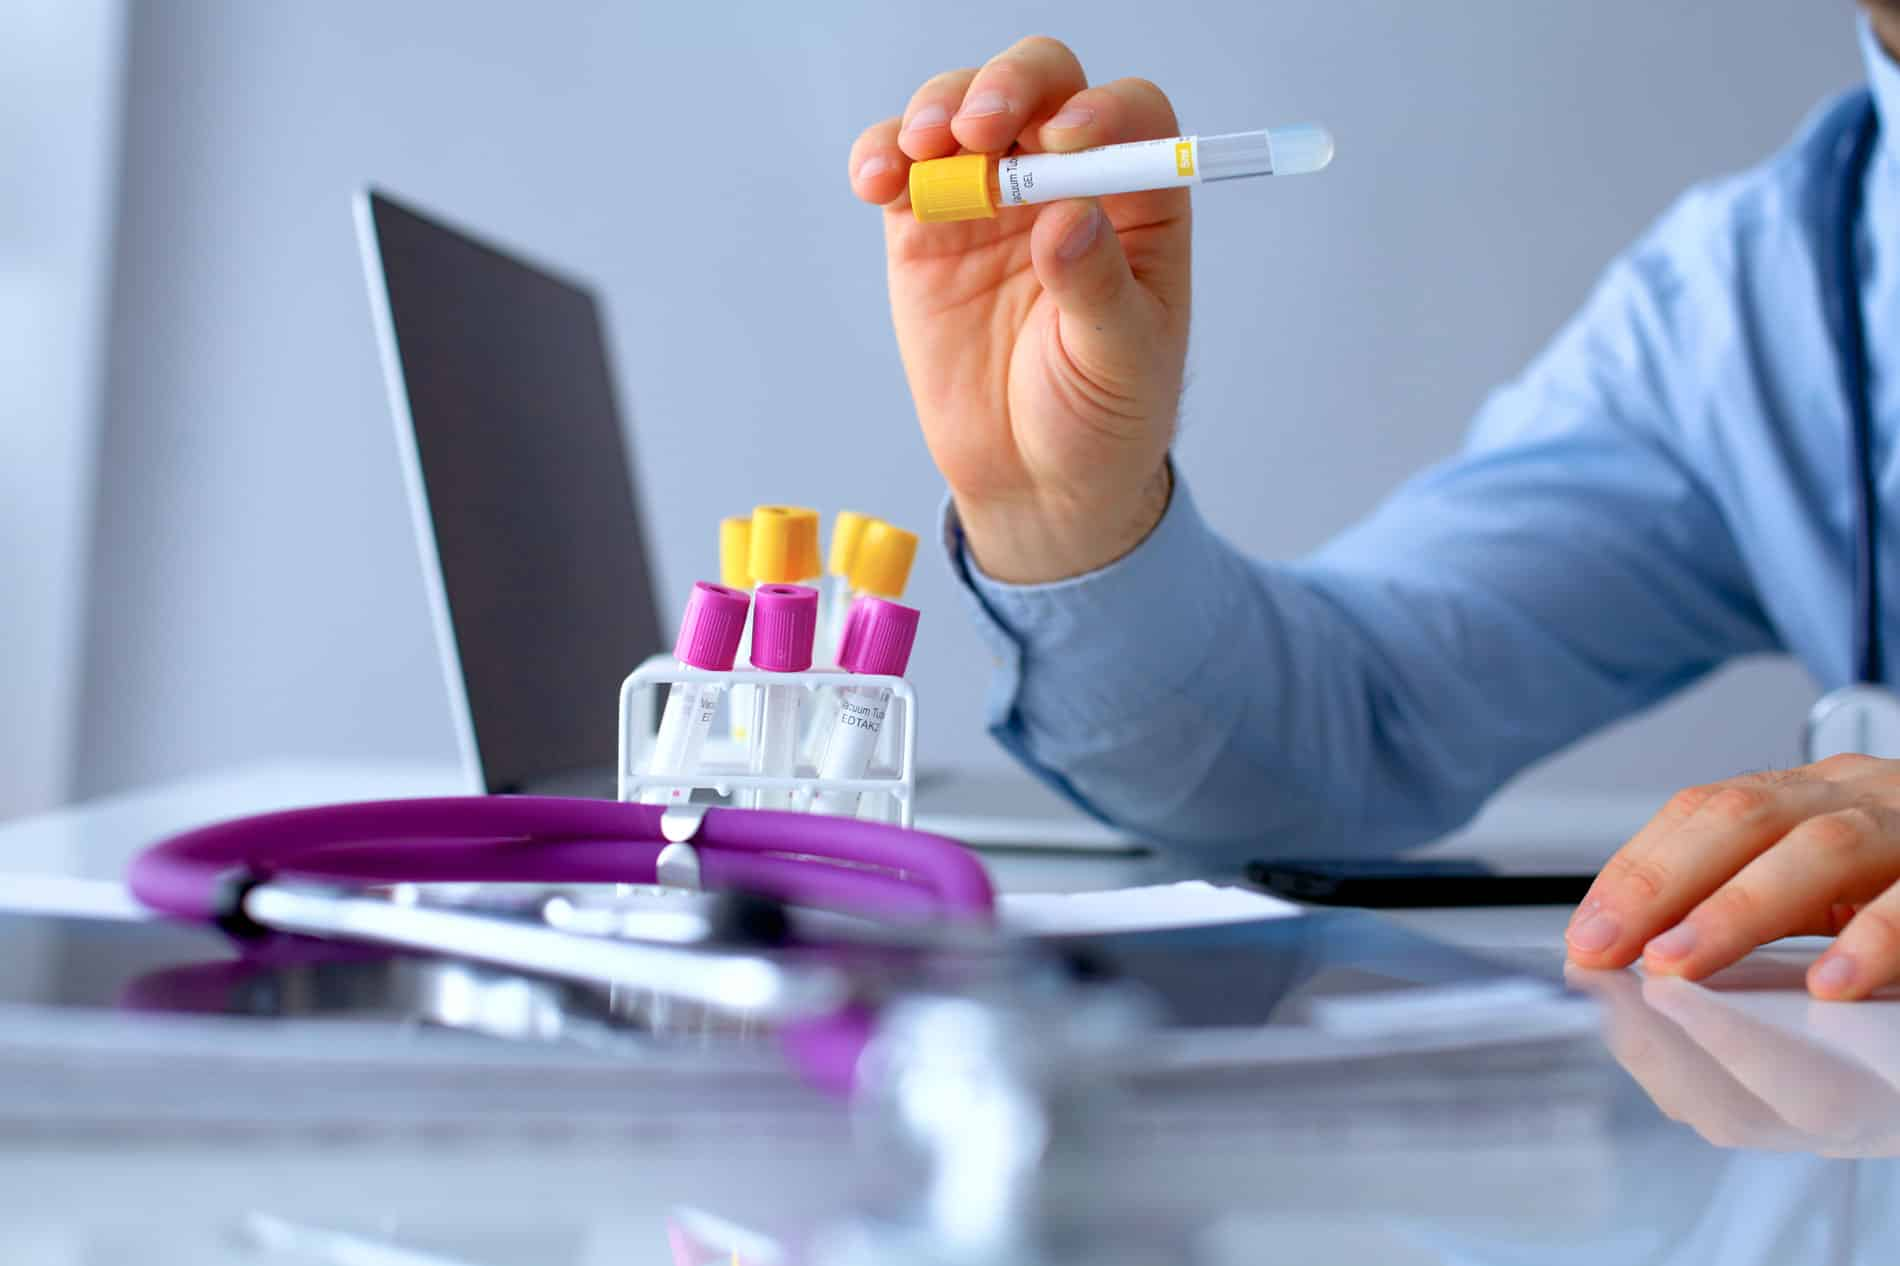 Wisconsin Drug Testing Consortium Releases New Website Strengthening Resources for Customers